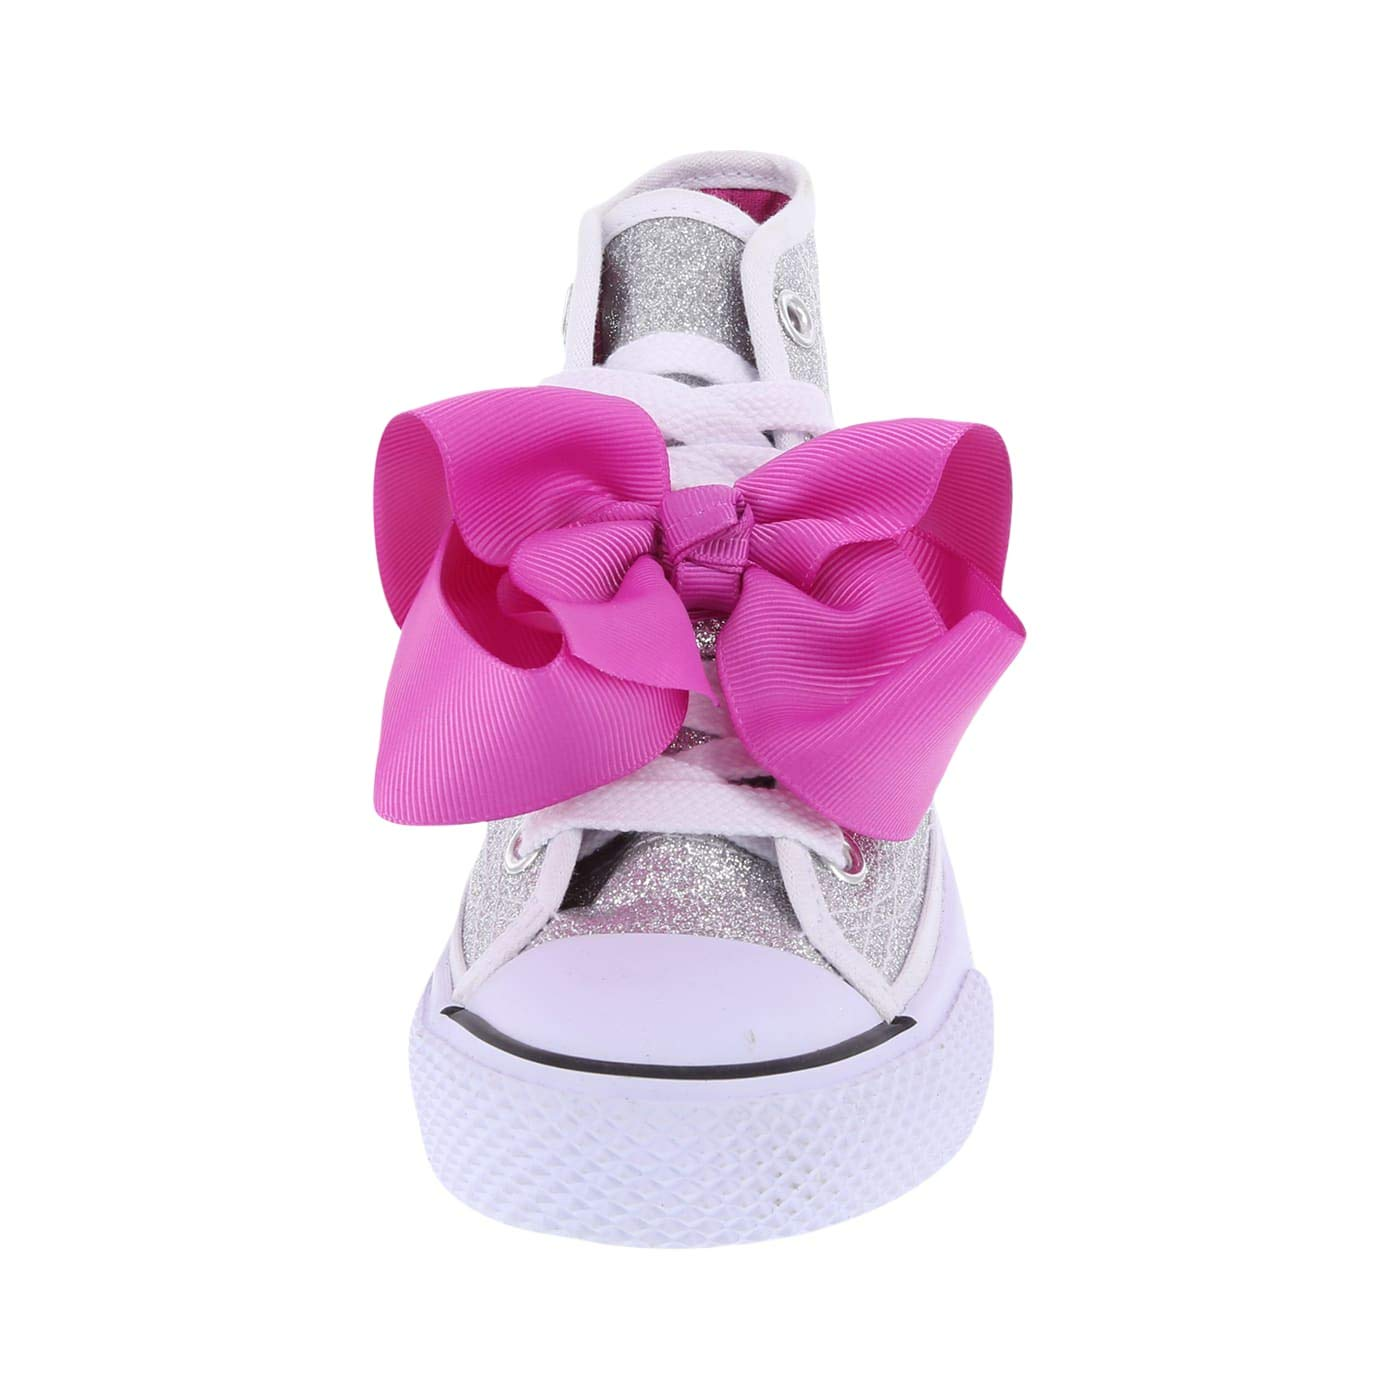 Nickelodeon Shoes Silver Girls JoJo Legacee Sneaker High-Top 2.5 Regular 174578025